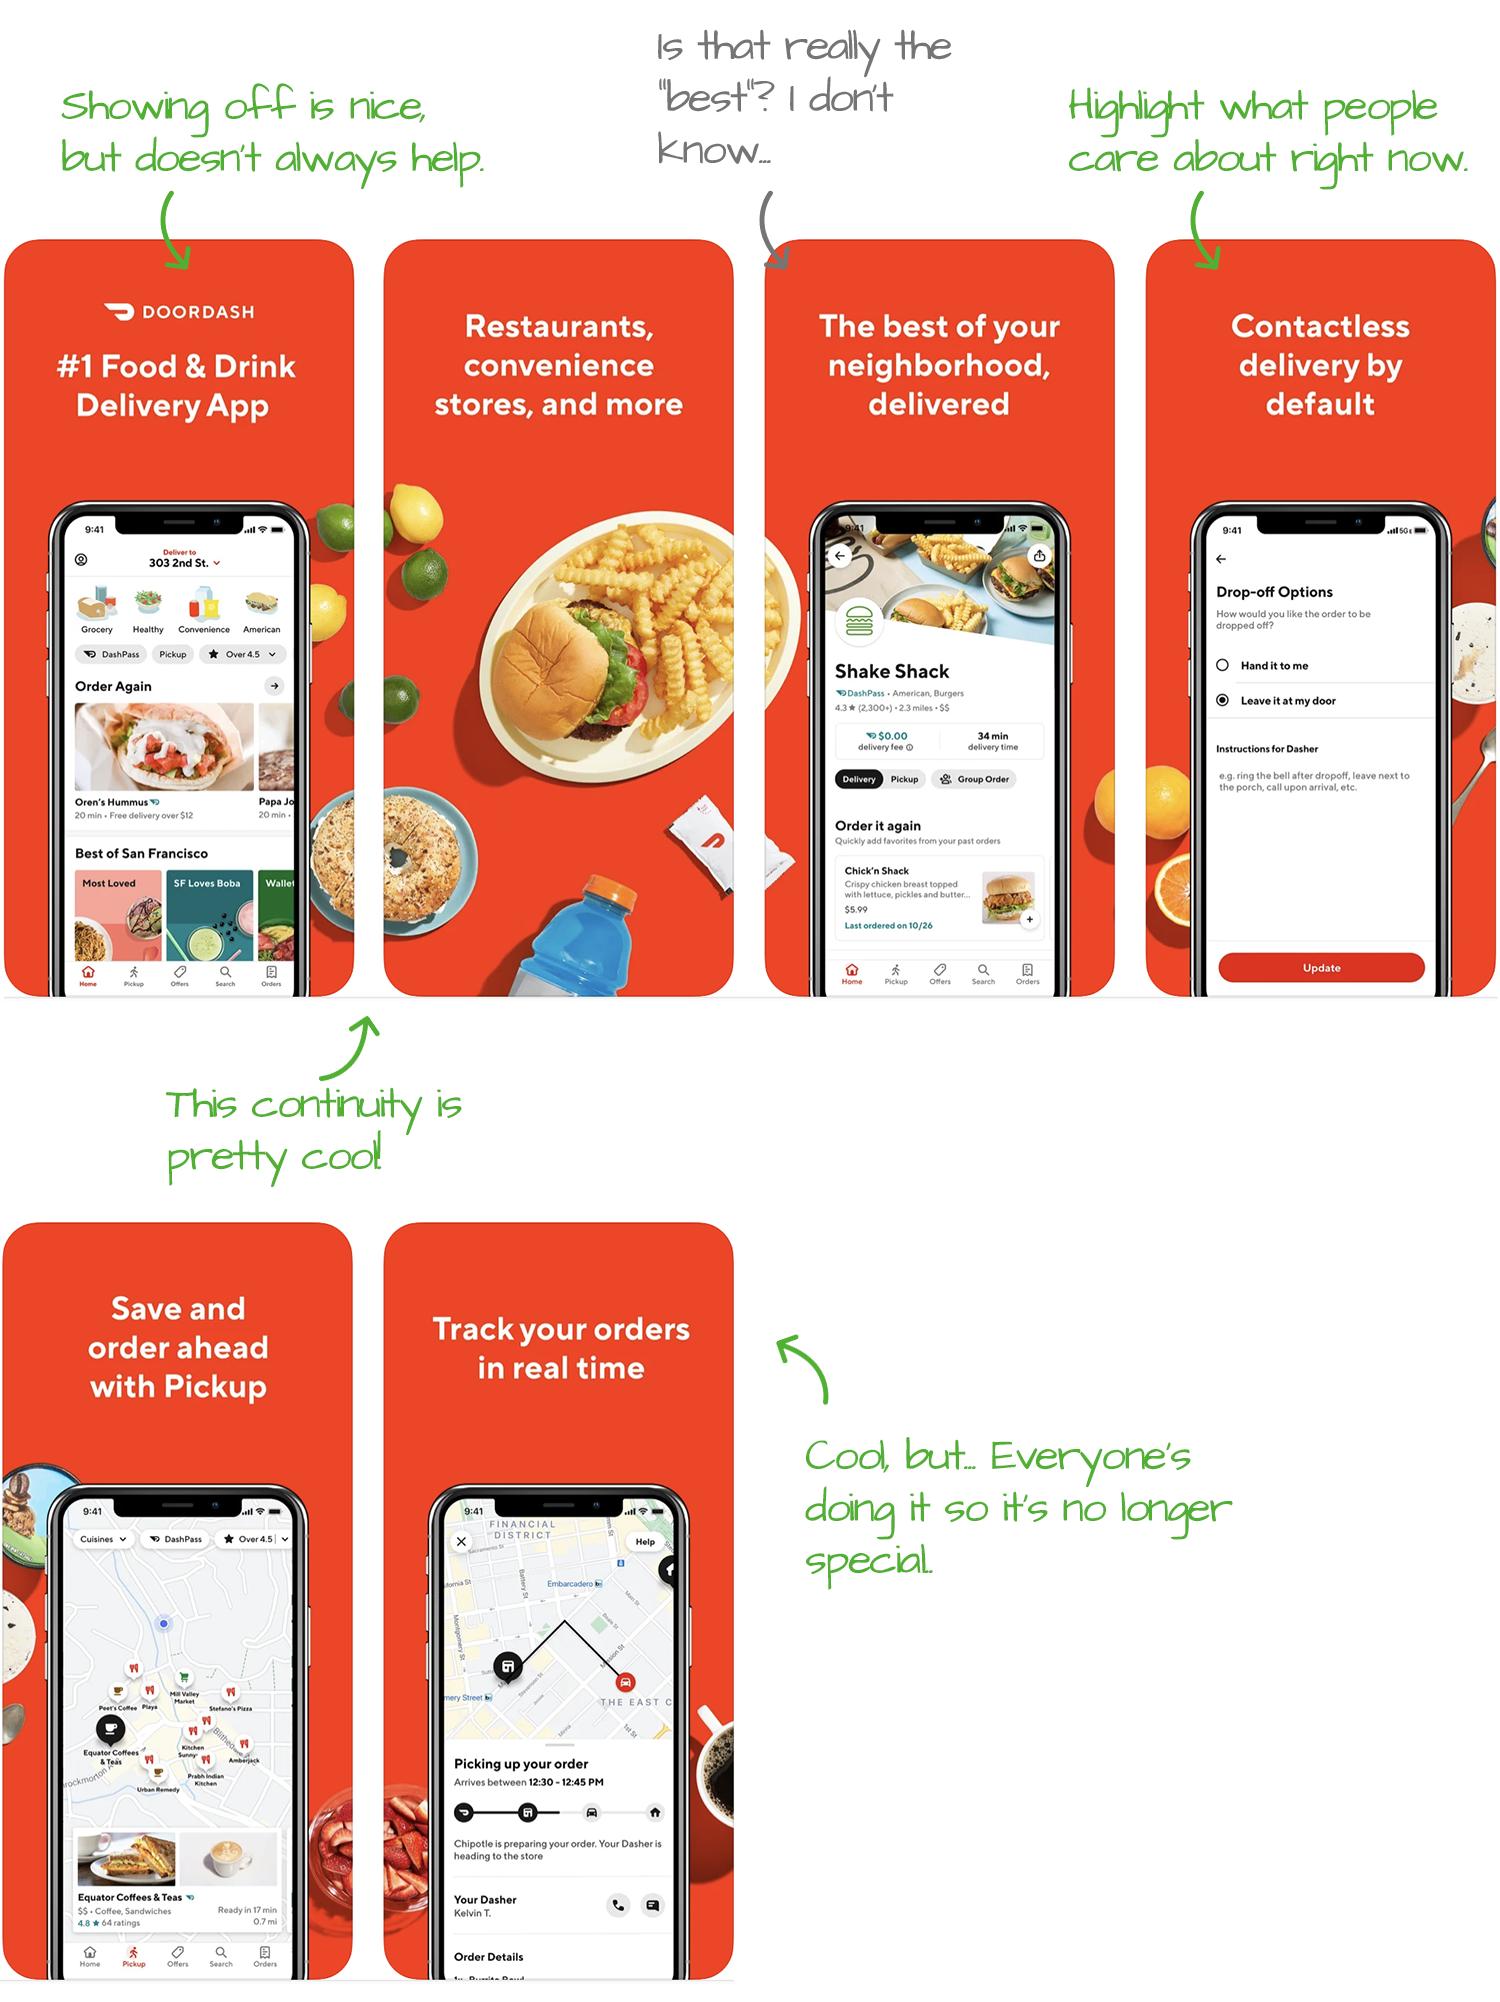 DoorDash for iOS Screenshot Analysis by Appfigures